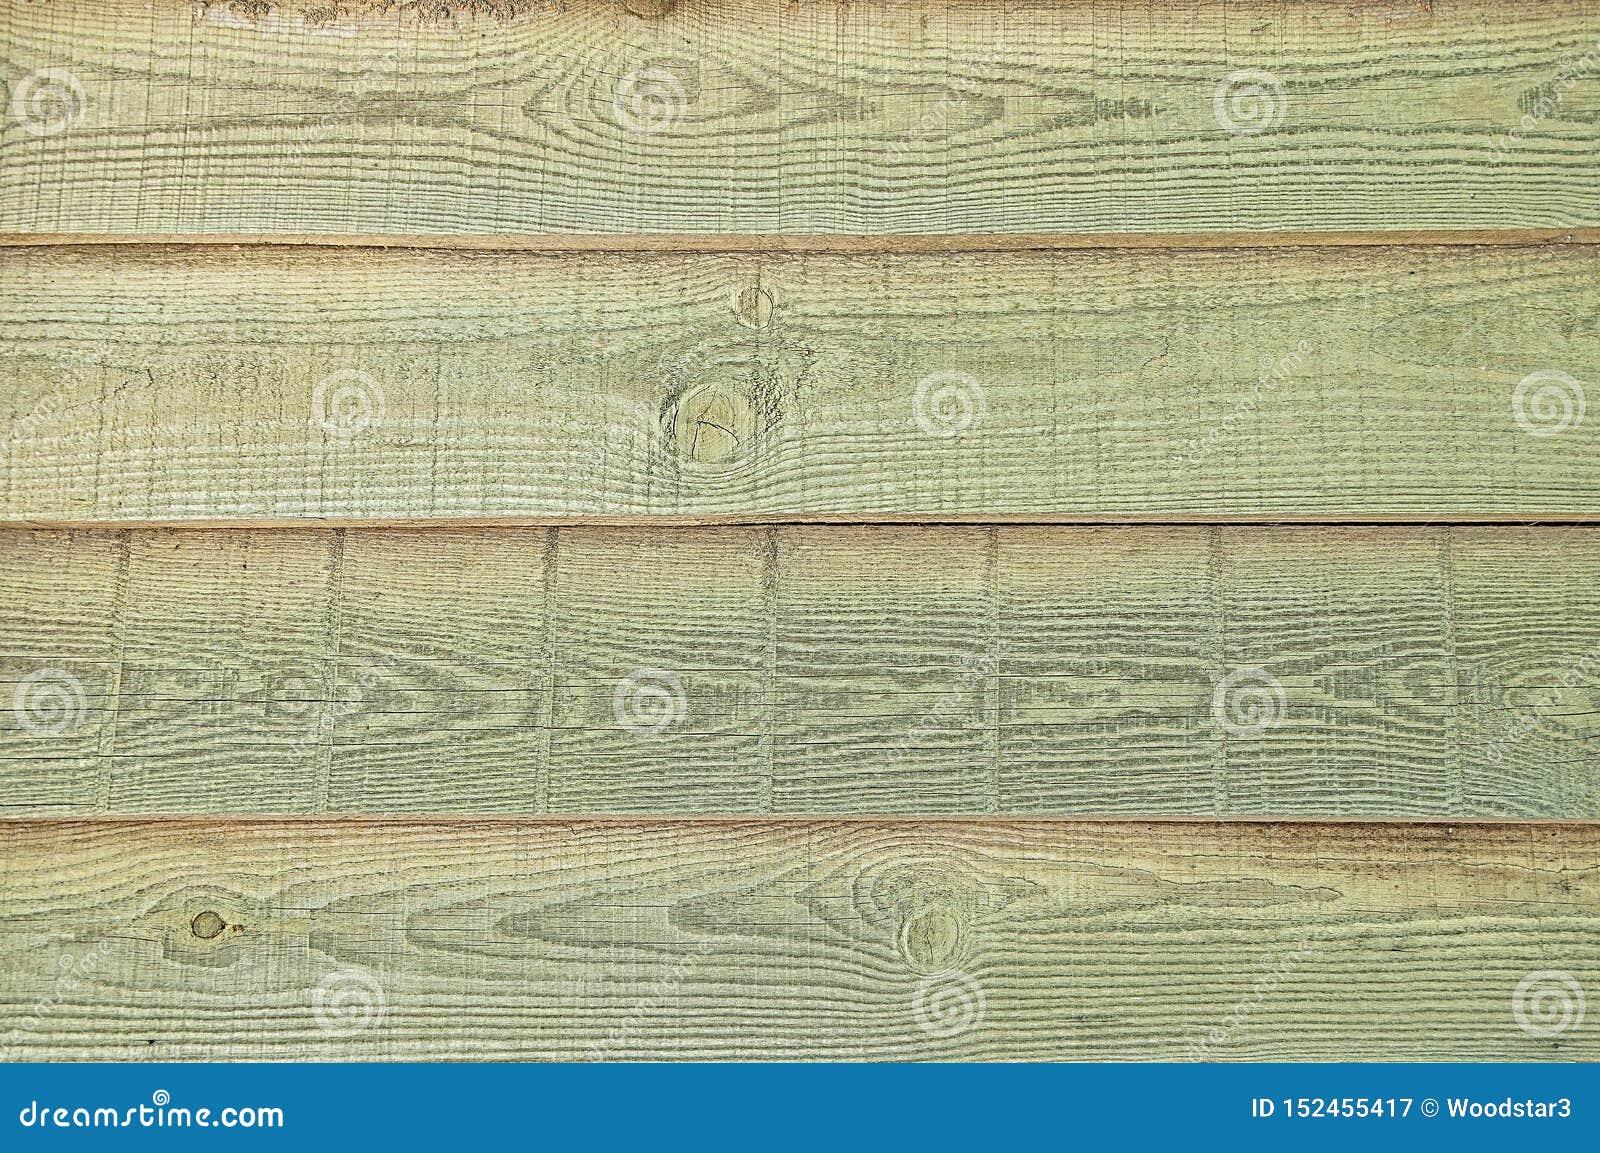 Texturas do fundo de placas idosas com pintura gasto e rachada Pranchas de madeira retros